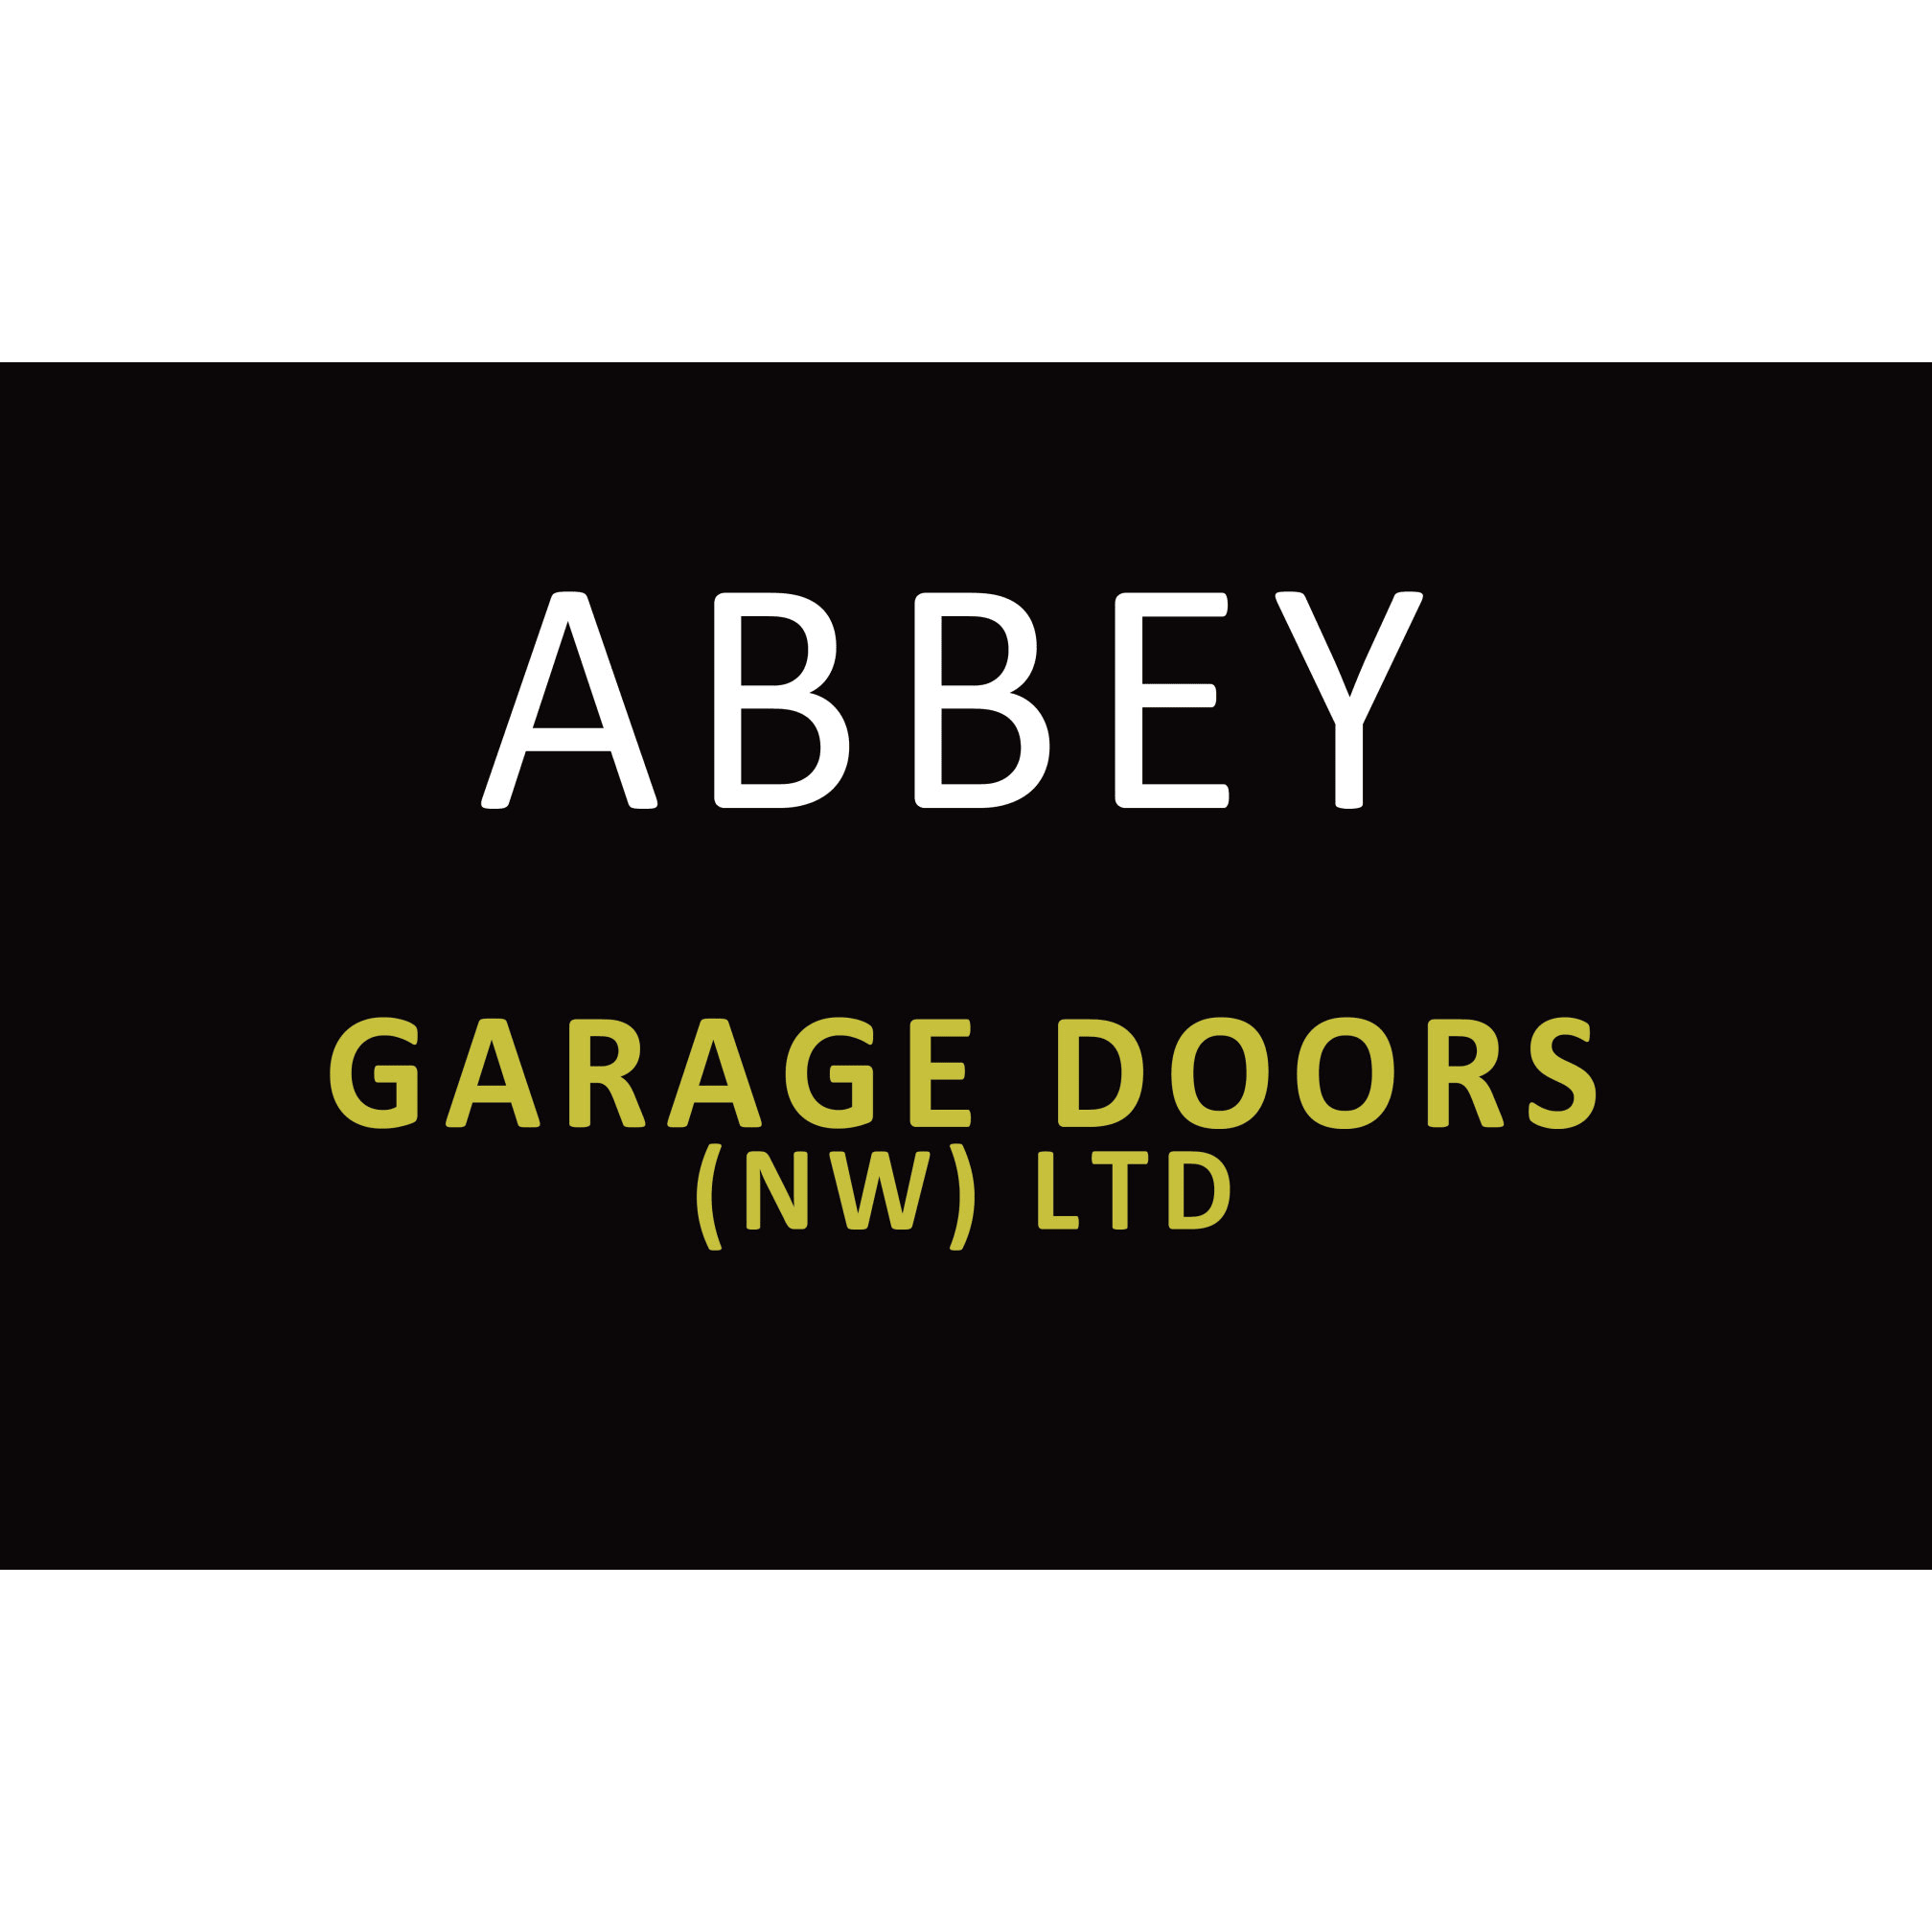 Abbey Garage Doors (NW) Ltd